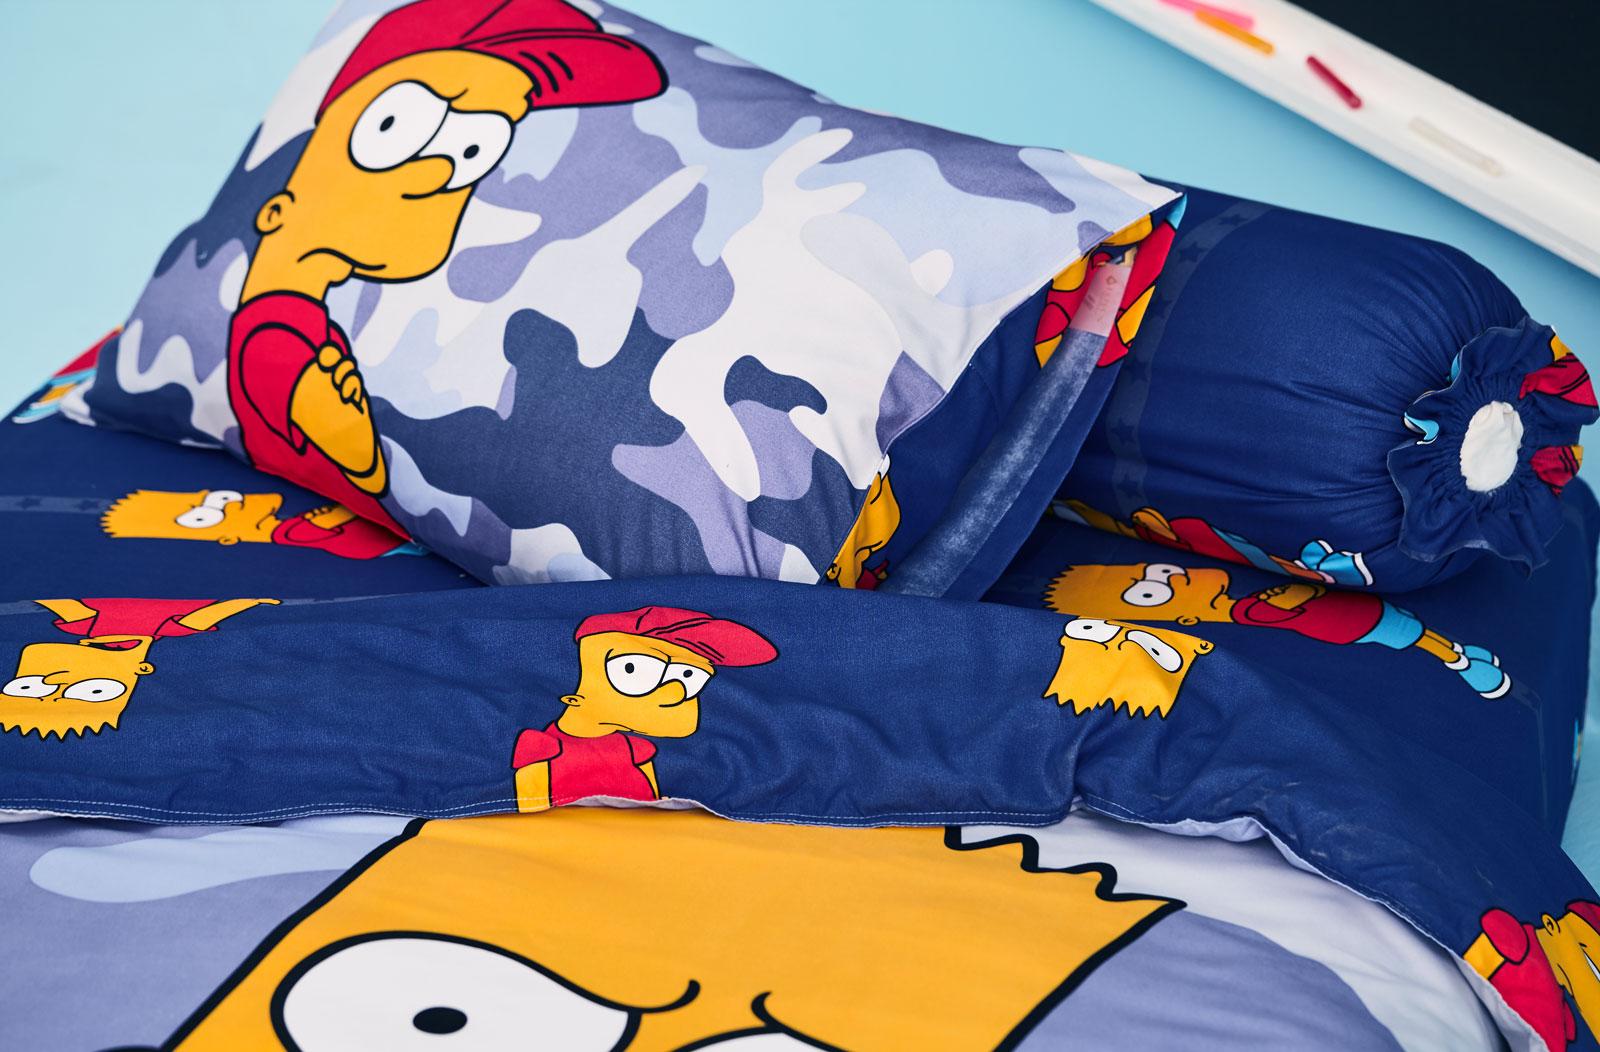 Lotus รุ่น Pop-art The Simpsons ชุดผ้าปูที่นอน LI-SS-06 (3.5 ft.)